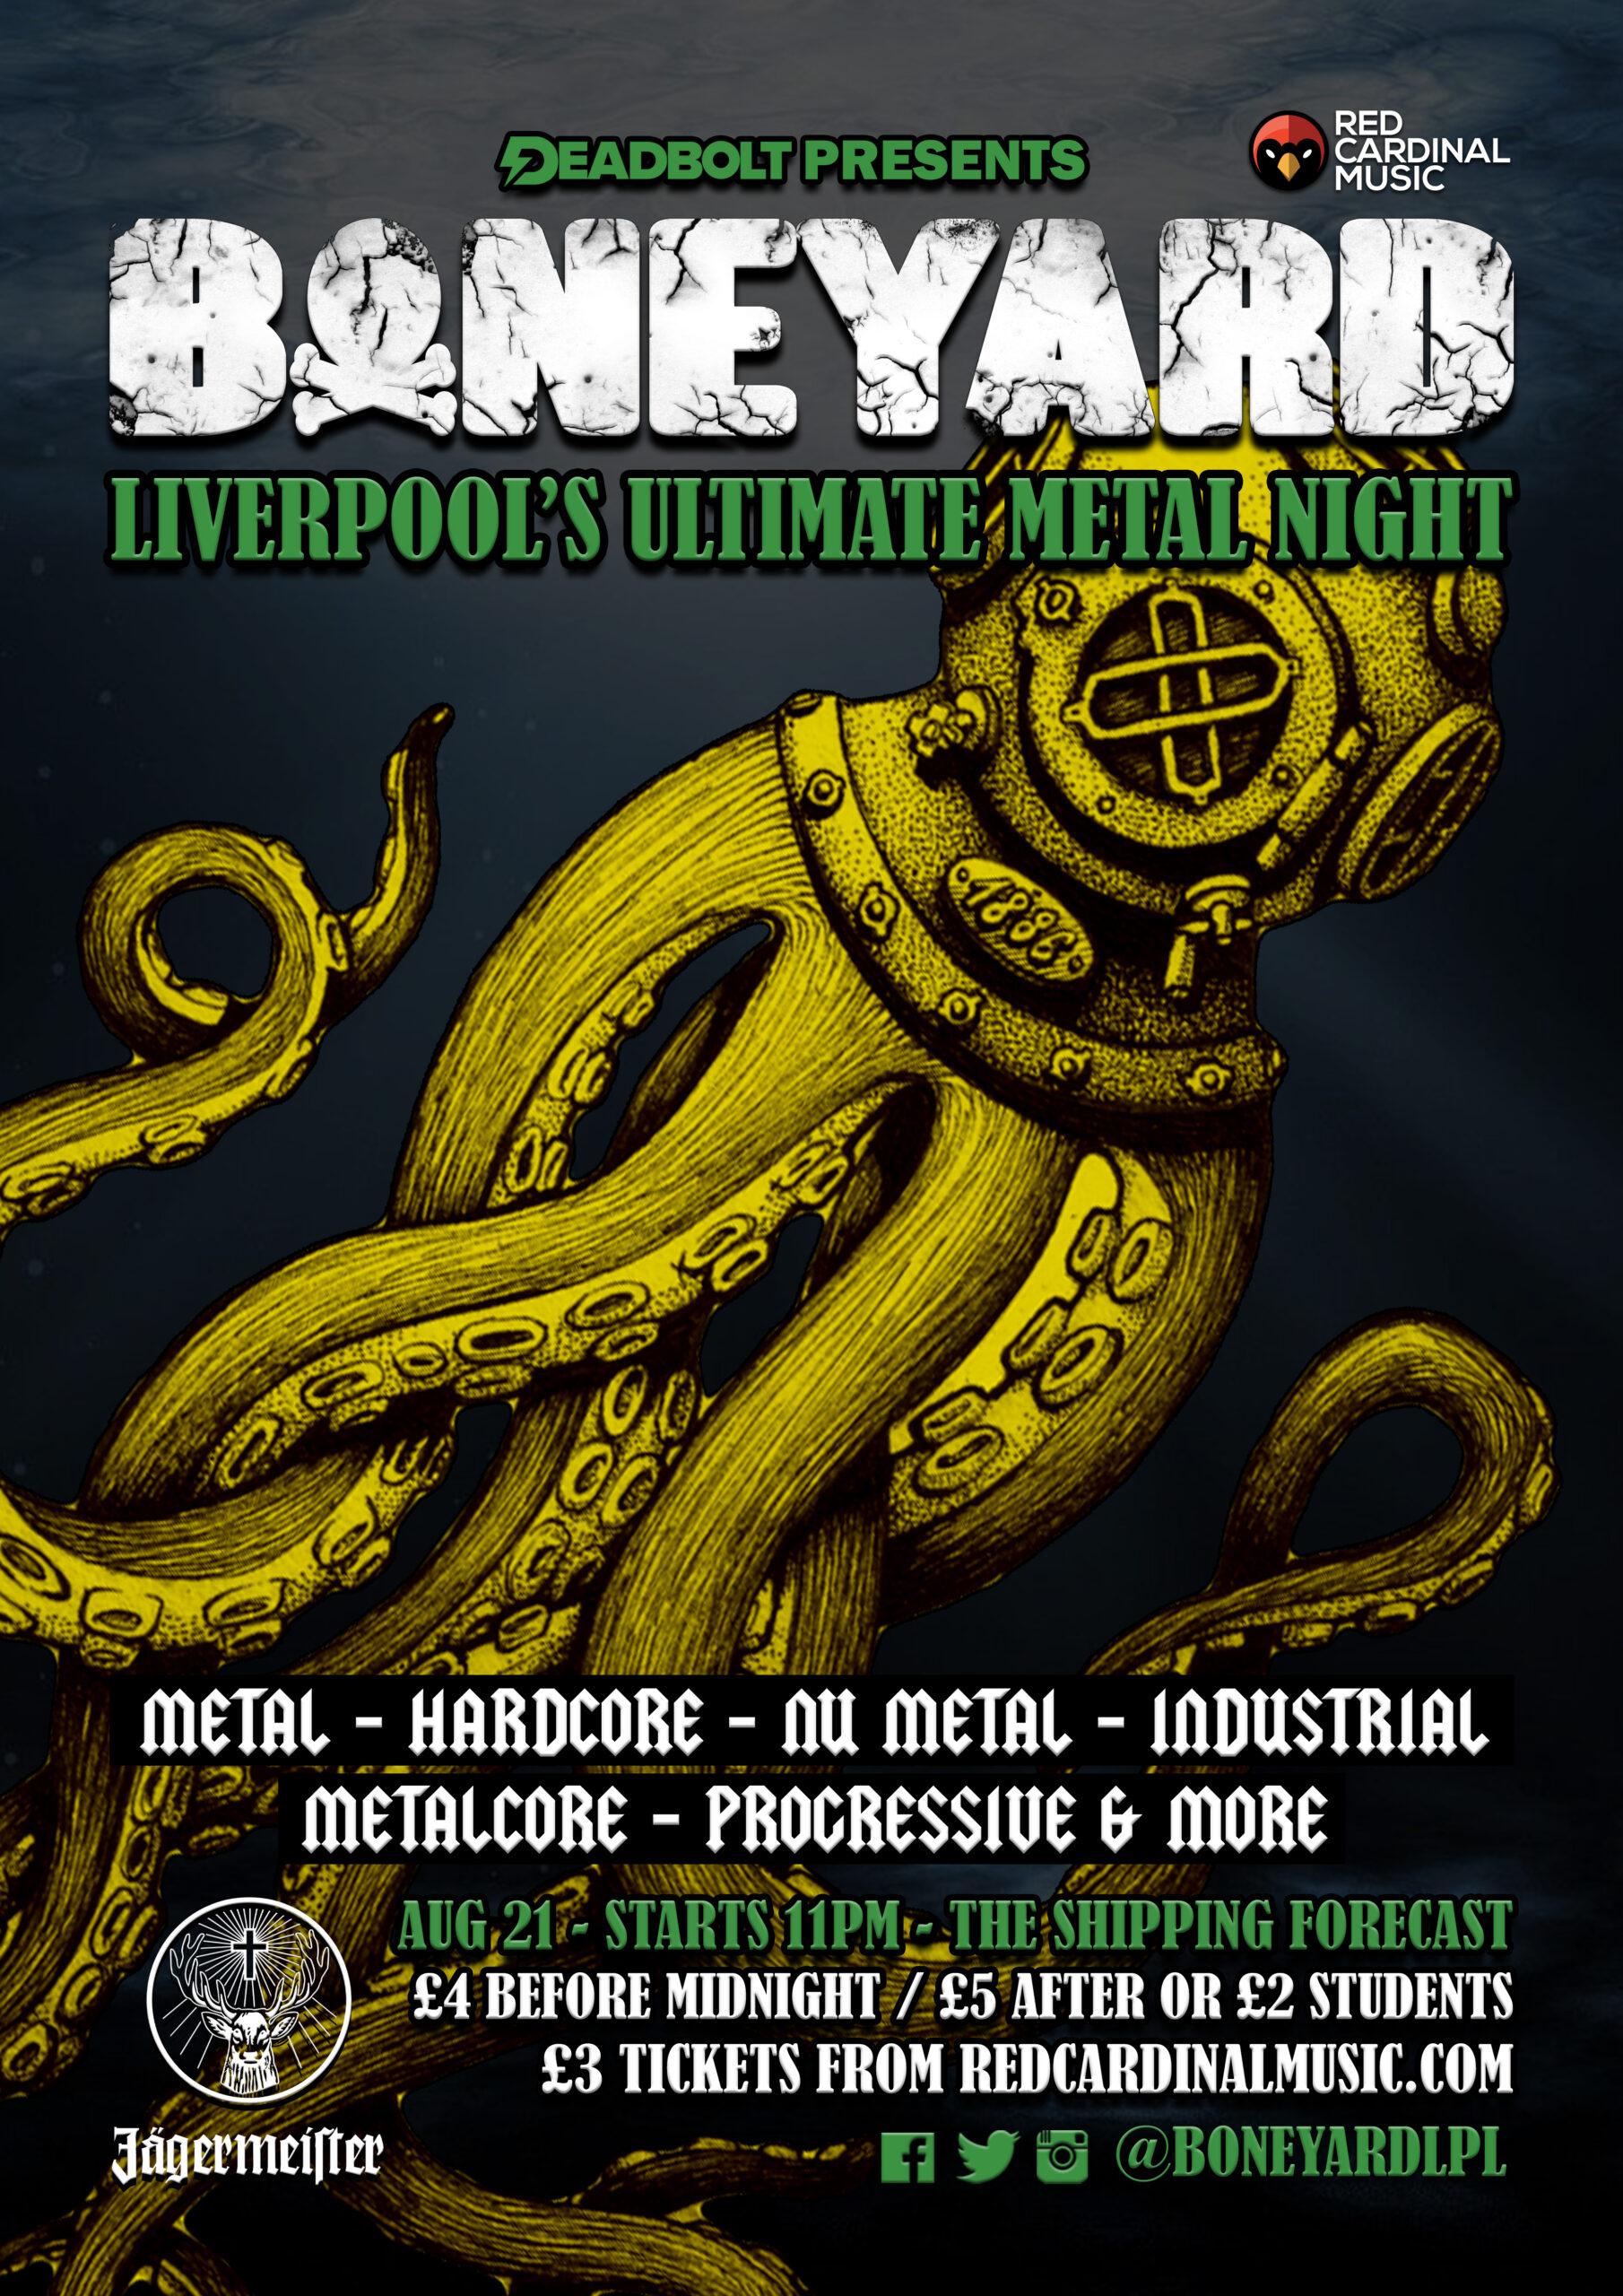 Boneyard - Shipping Forecast Liverpool - Aug 21 - Poster - RGB Web